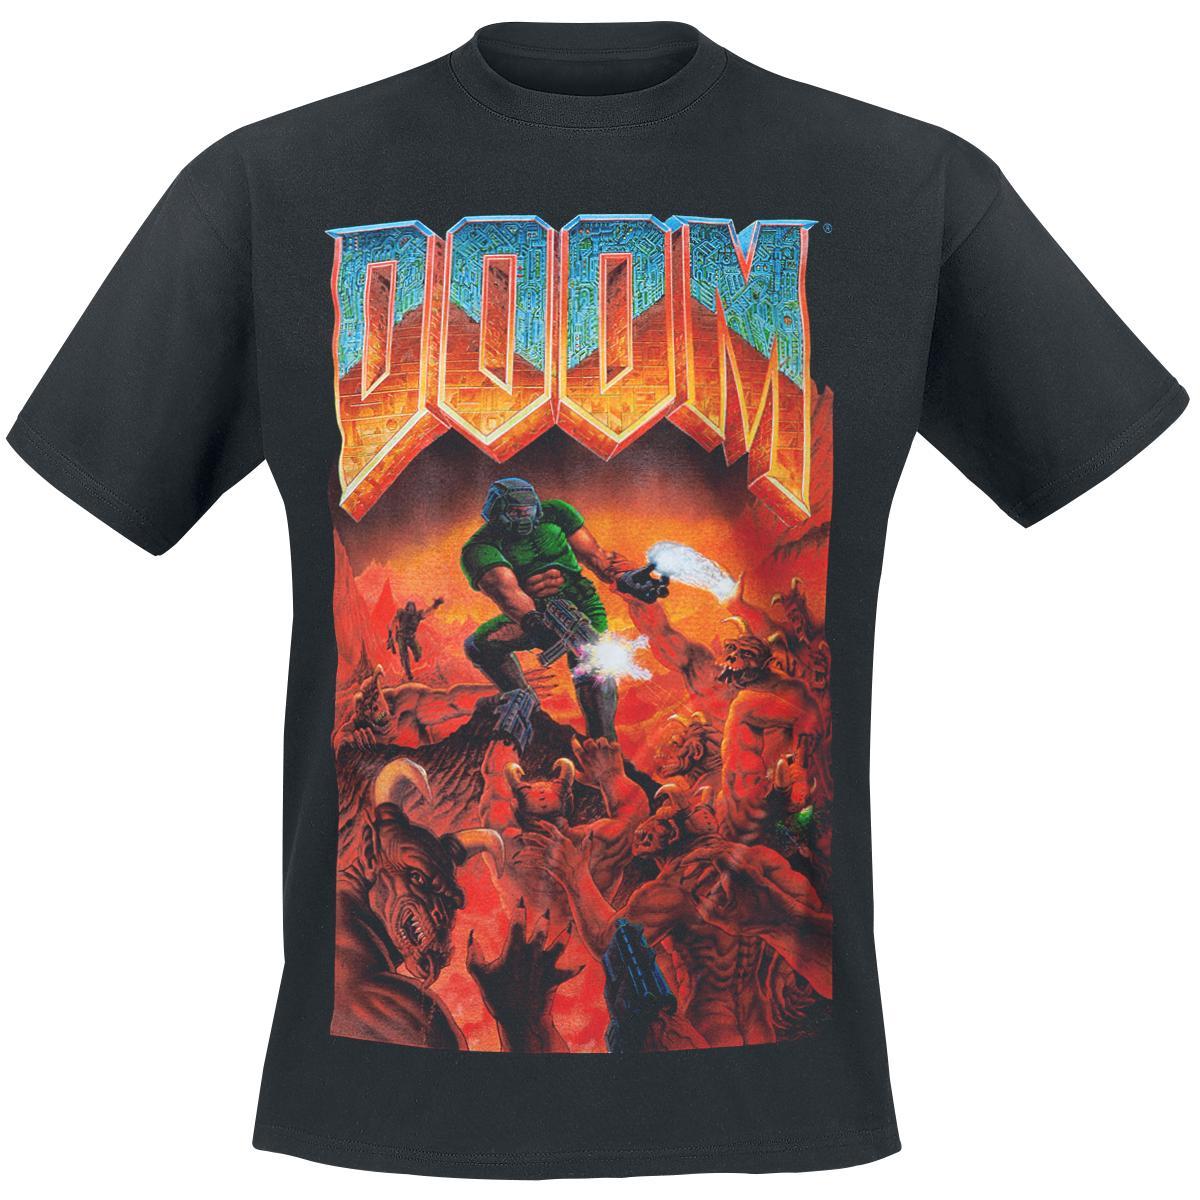 Classic Boxart T-shirt Design tee